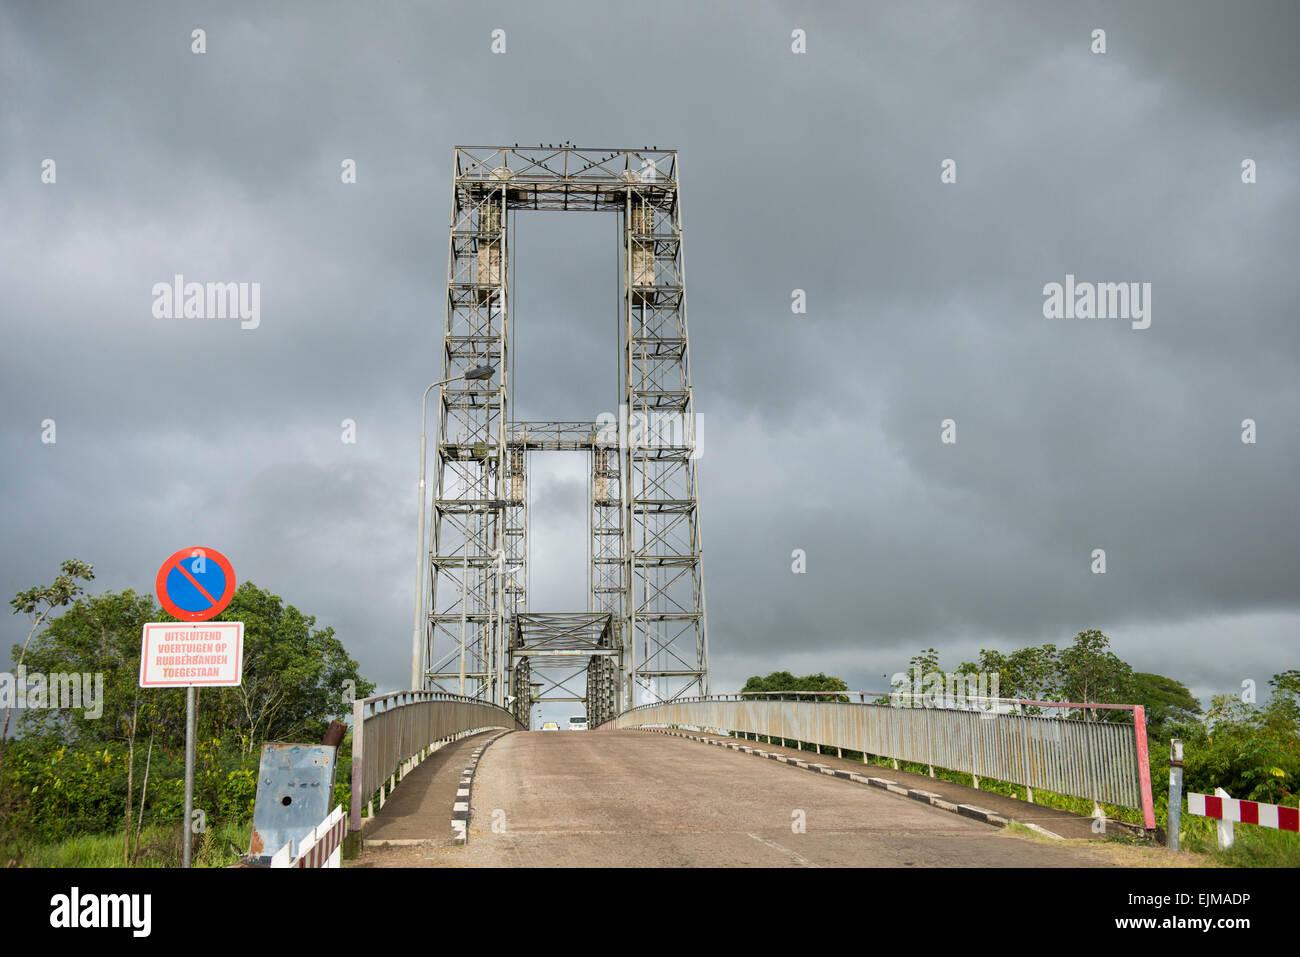 Bridge over the Nickerie River, Suriname - Stock Image